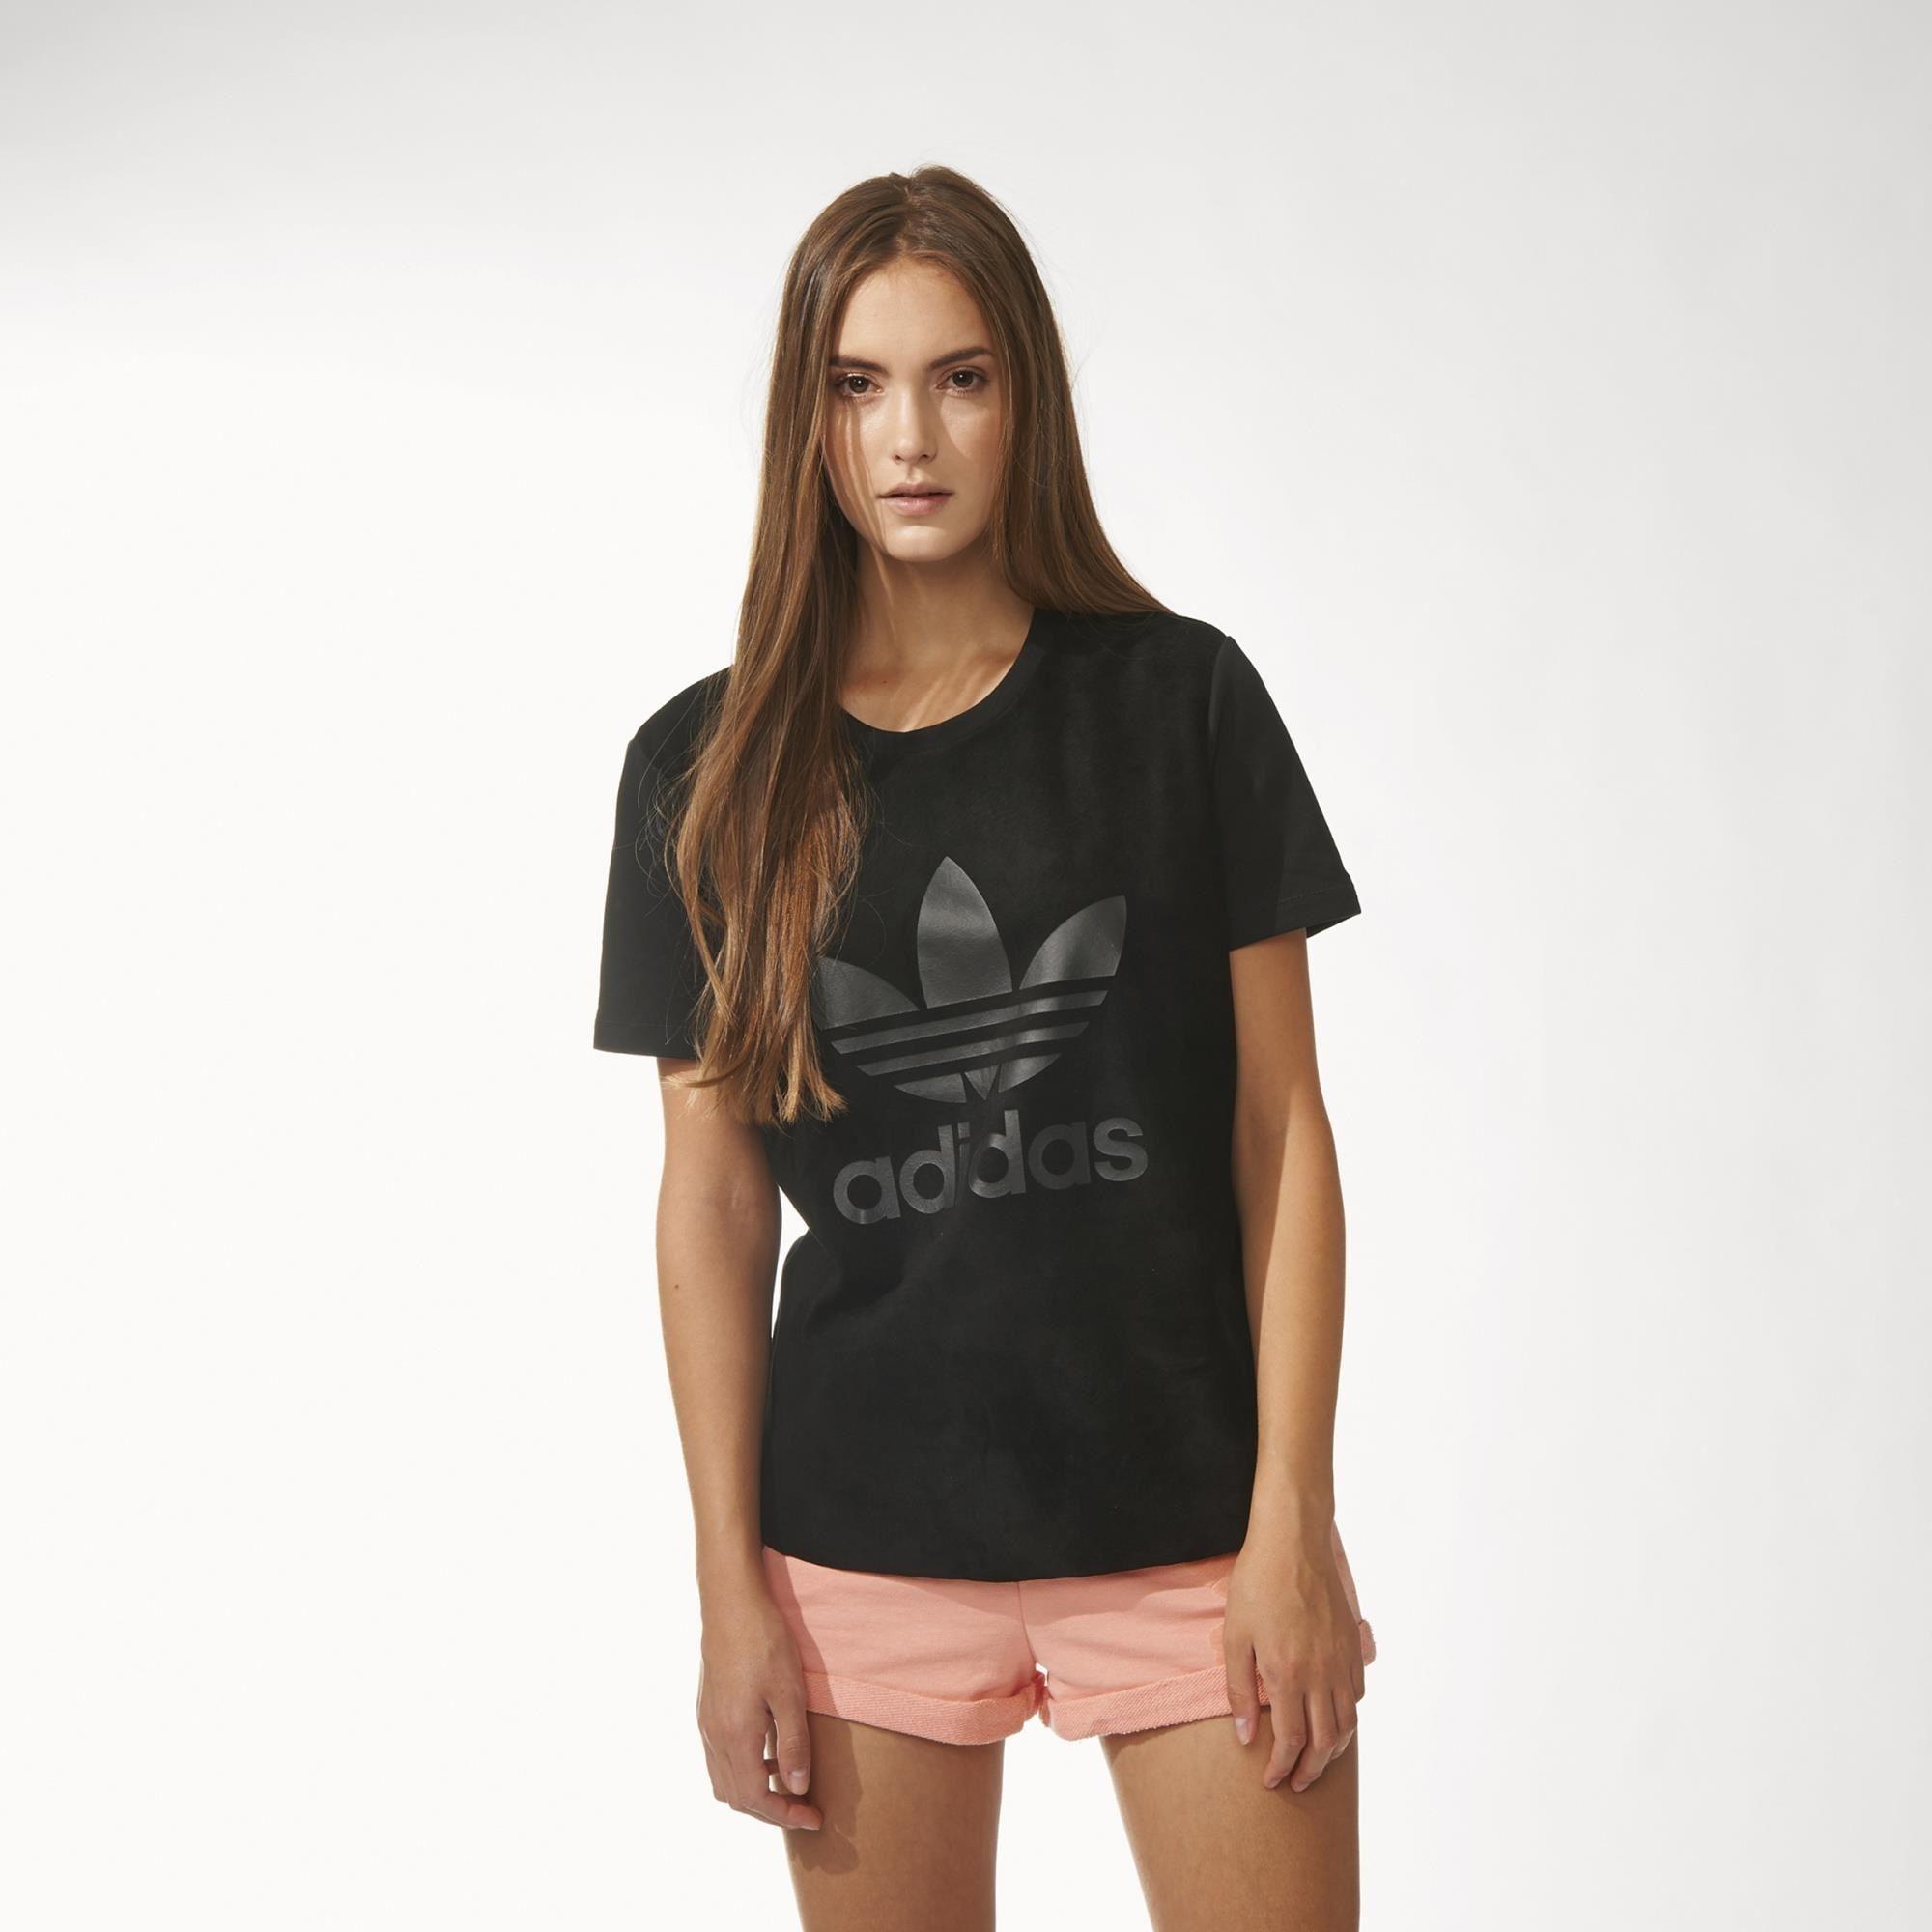 adidas - Playera Originals Suede Mix Mujer   Adidas ...